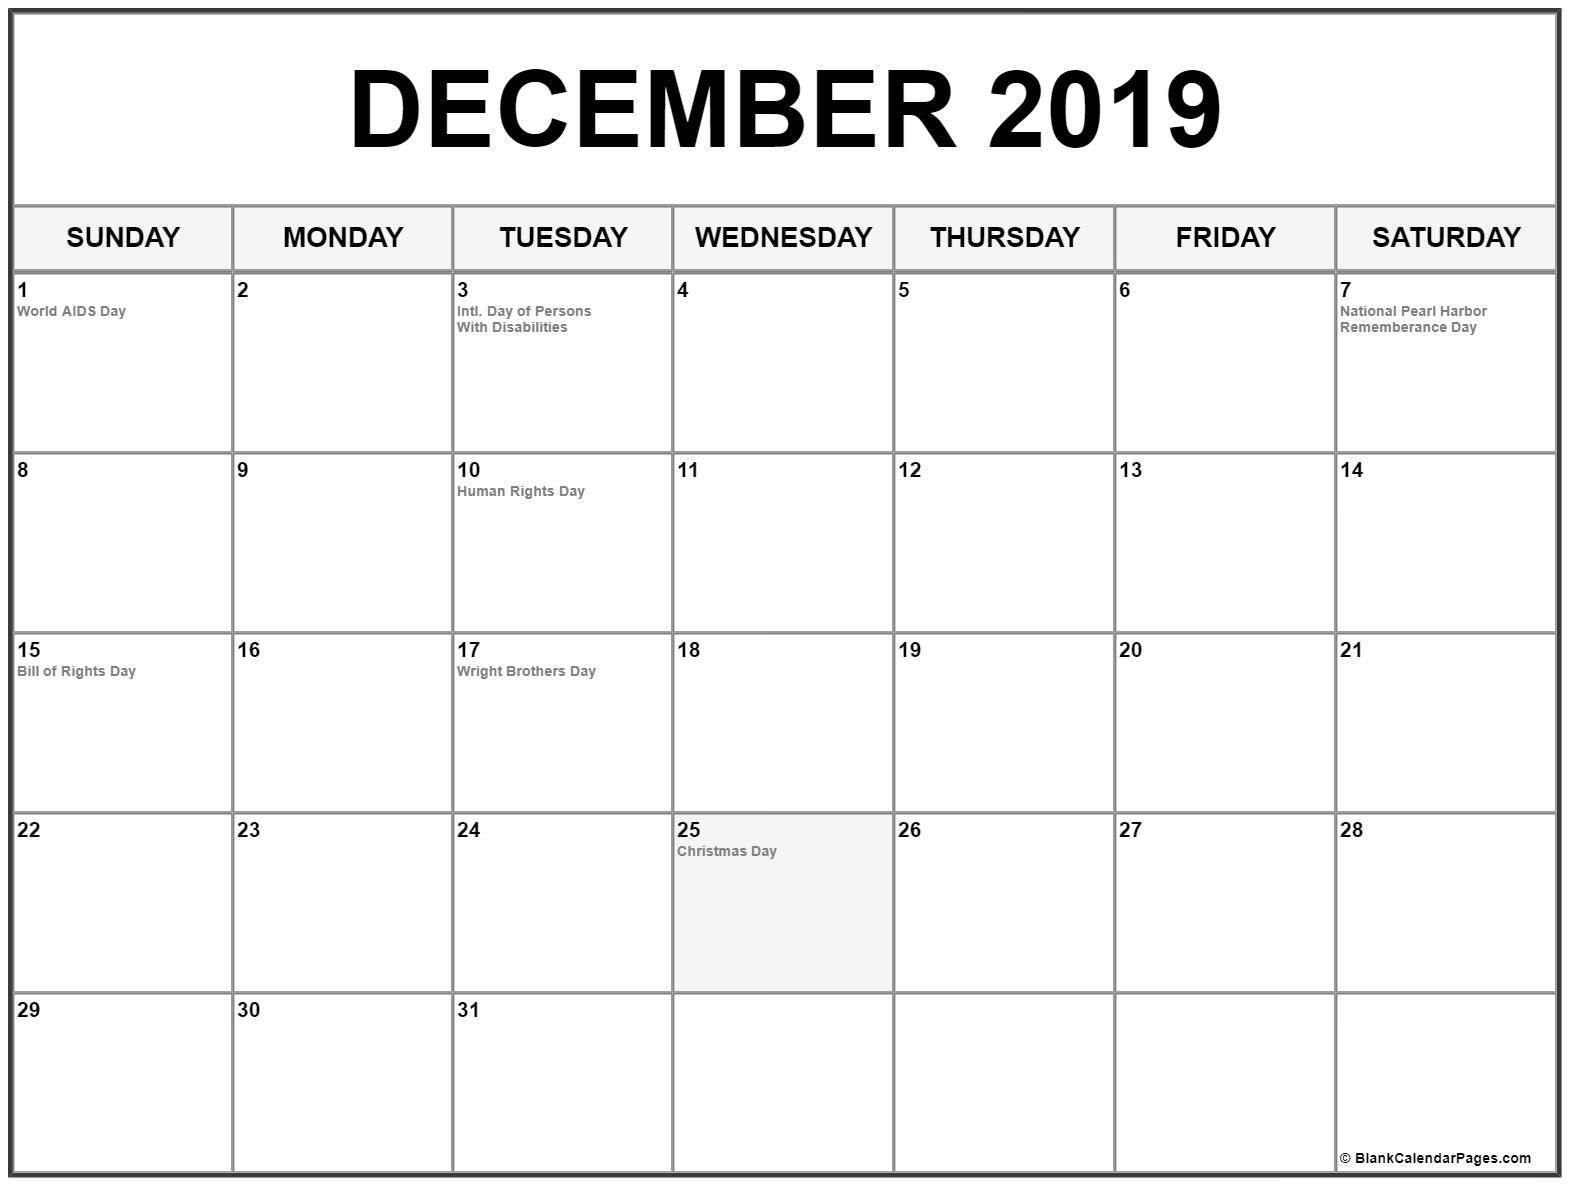 2019 December Calendar December Calendar 2019 #December #December2019